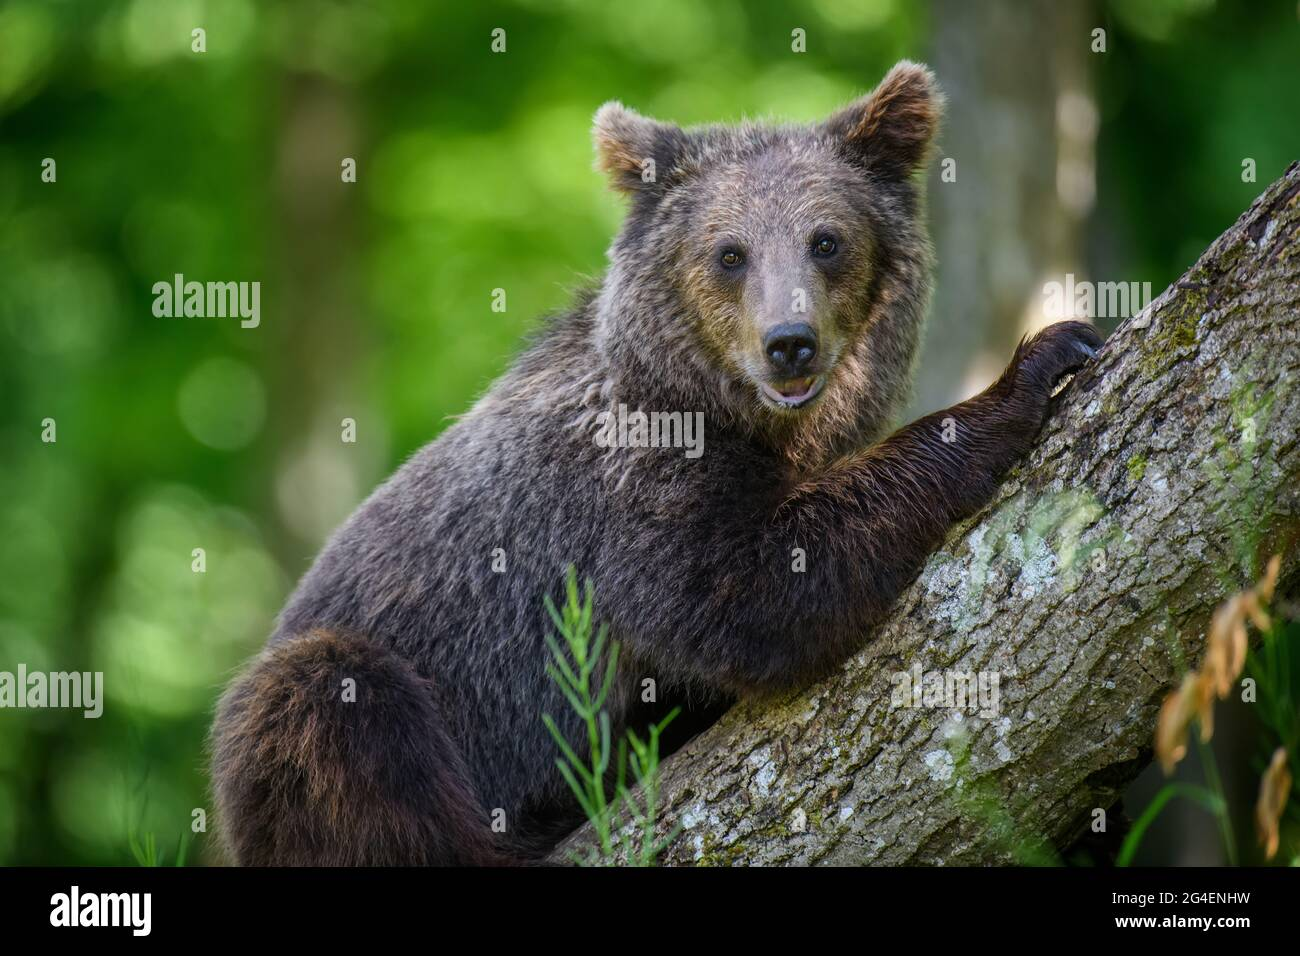 Wild Brown Bear (Ursus Arctos) in the summer forest. Animal in natural habitat. Wildlife scene Stock Photo